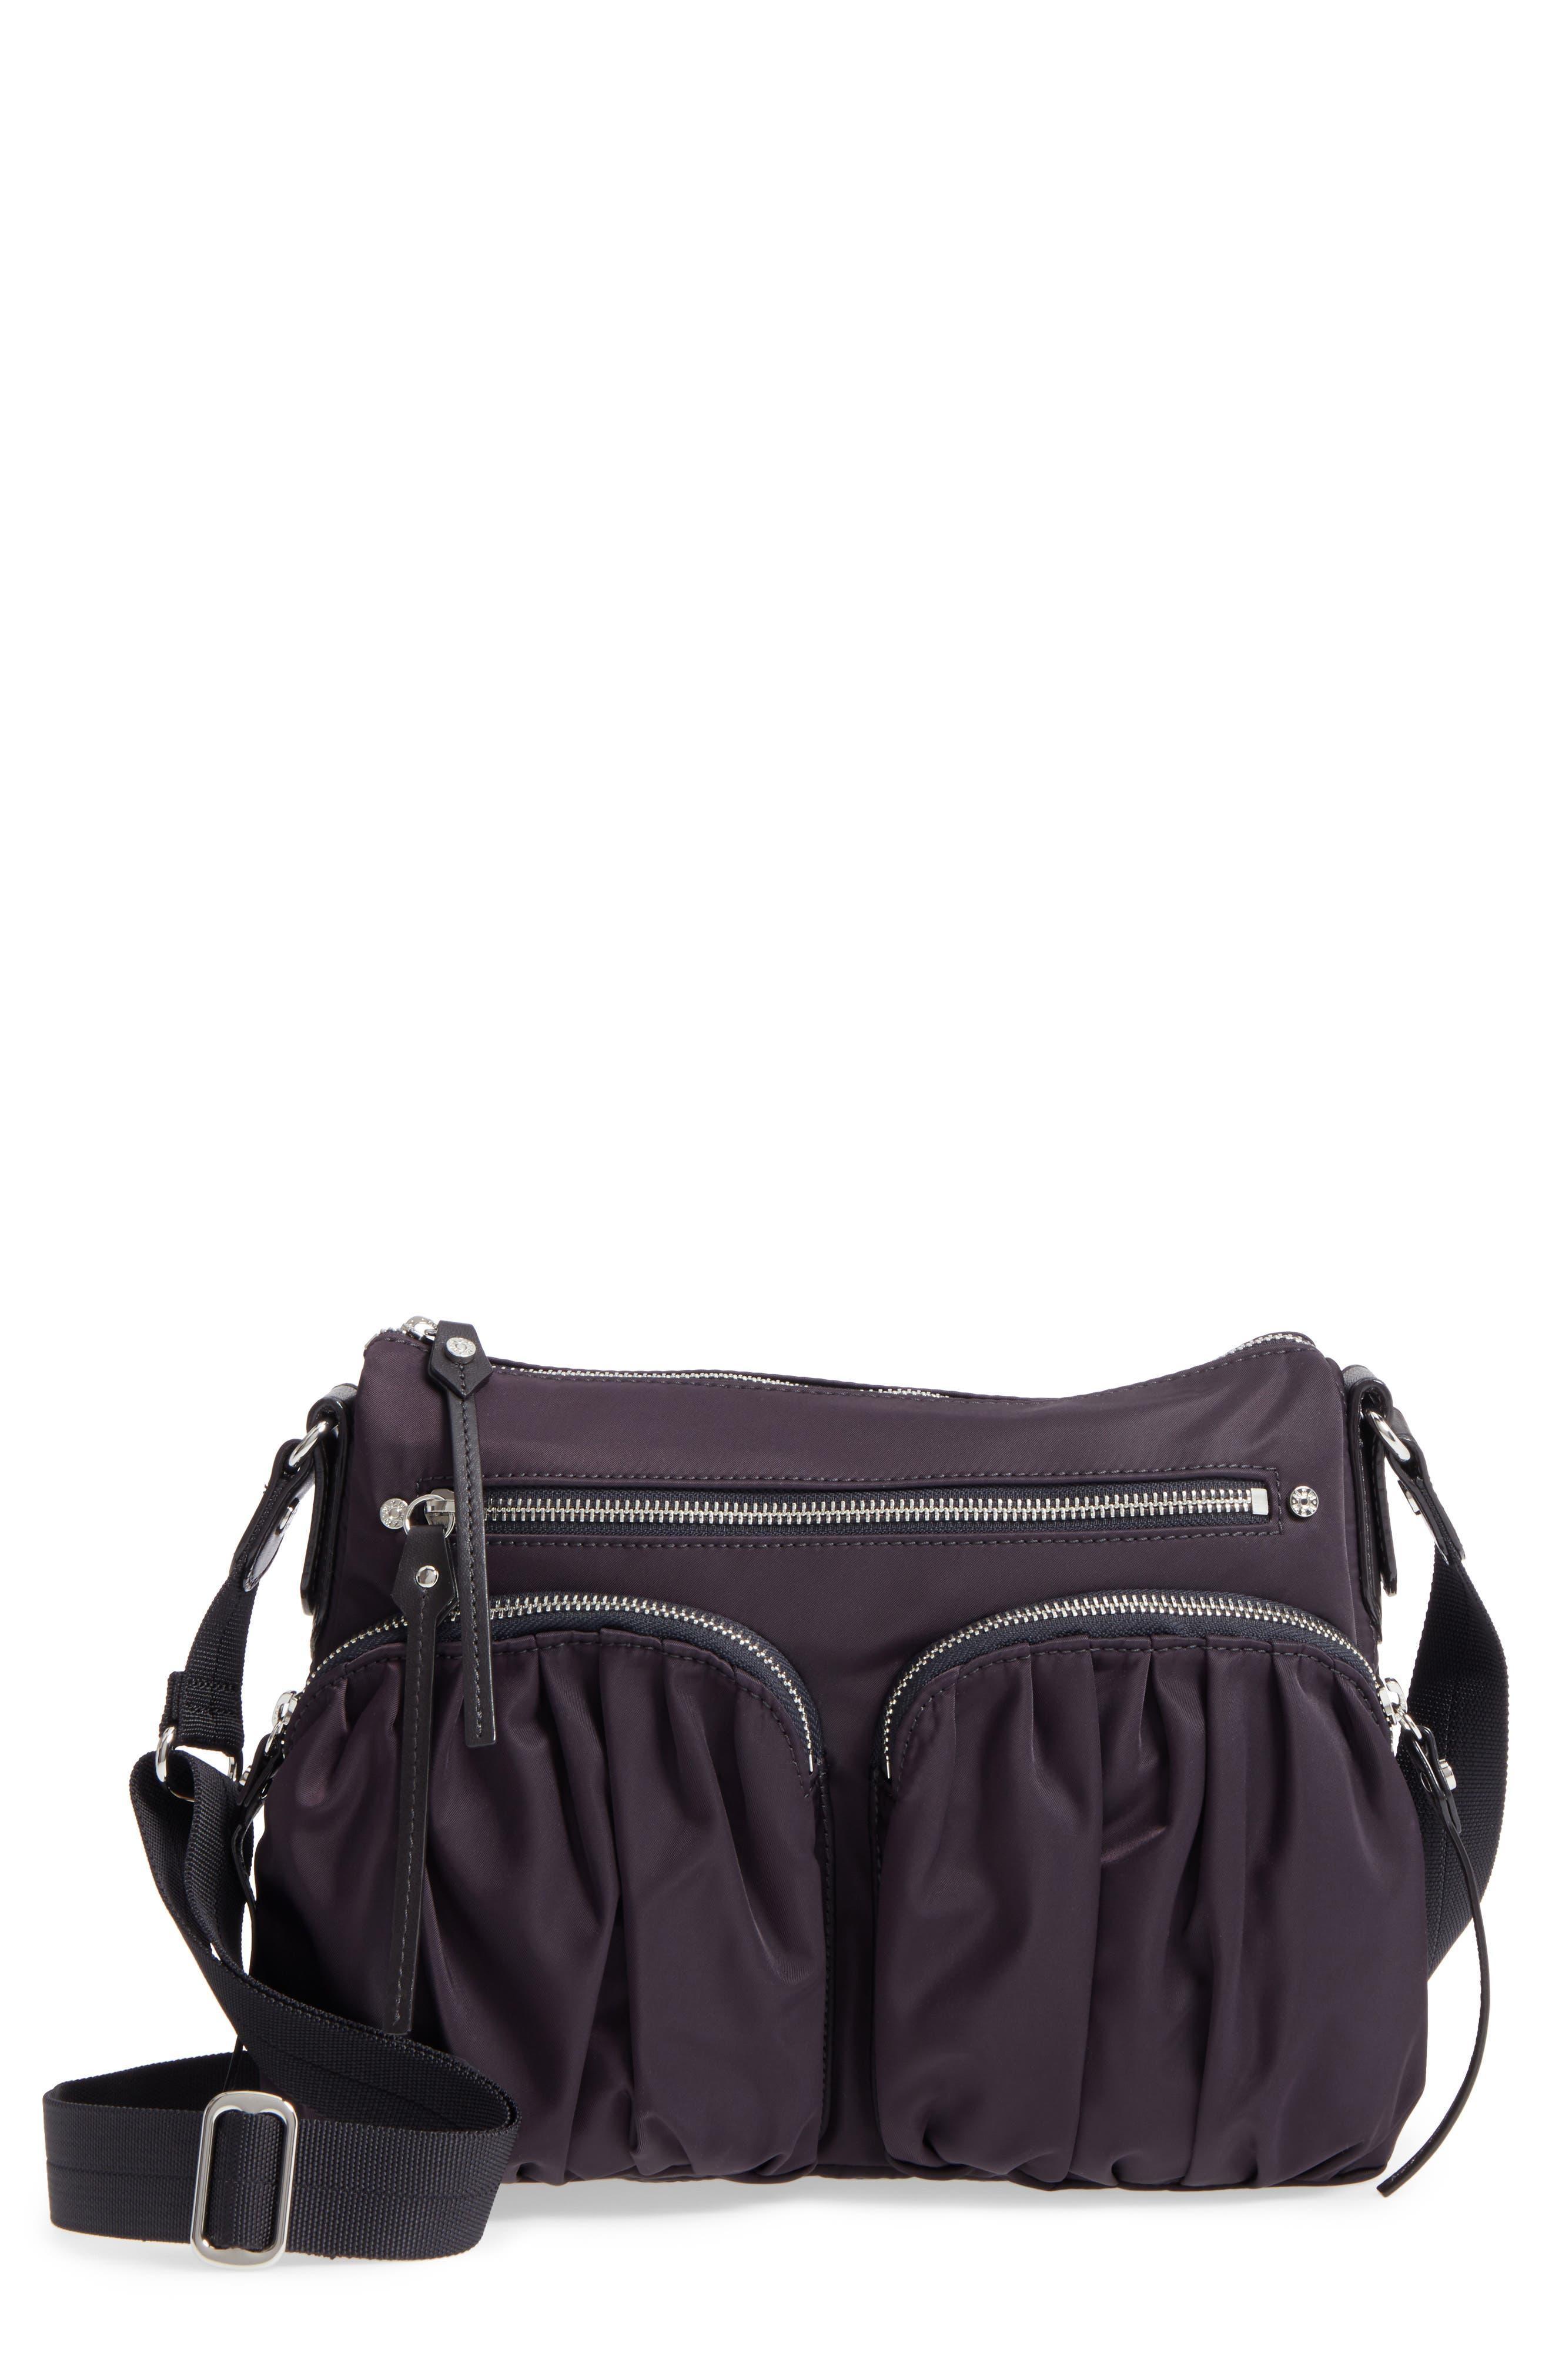 Main Image - MZ Wallace 'Paige' Bedford Nylon Crossbody Bag